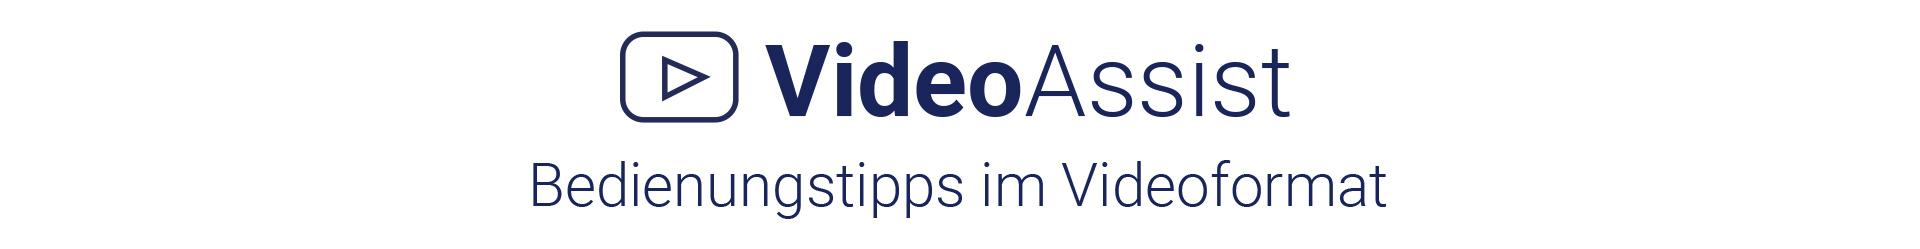 MKN VideoAssist Banner